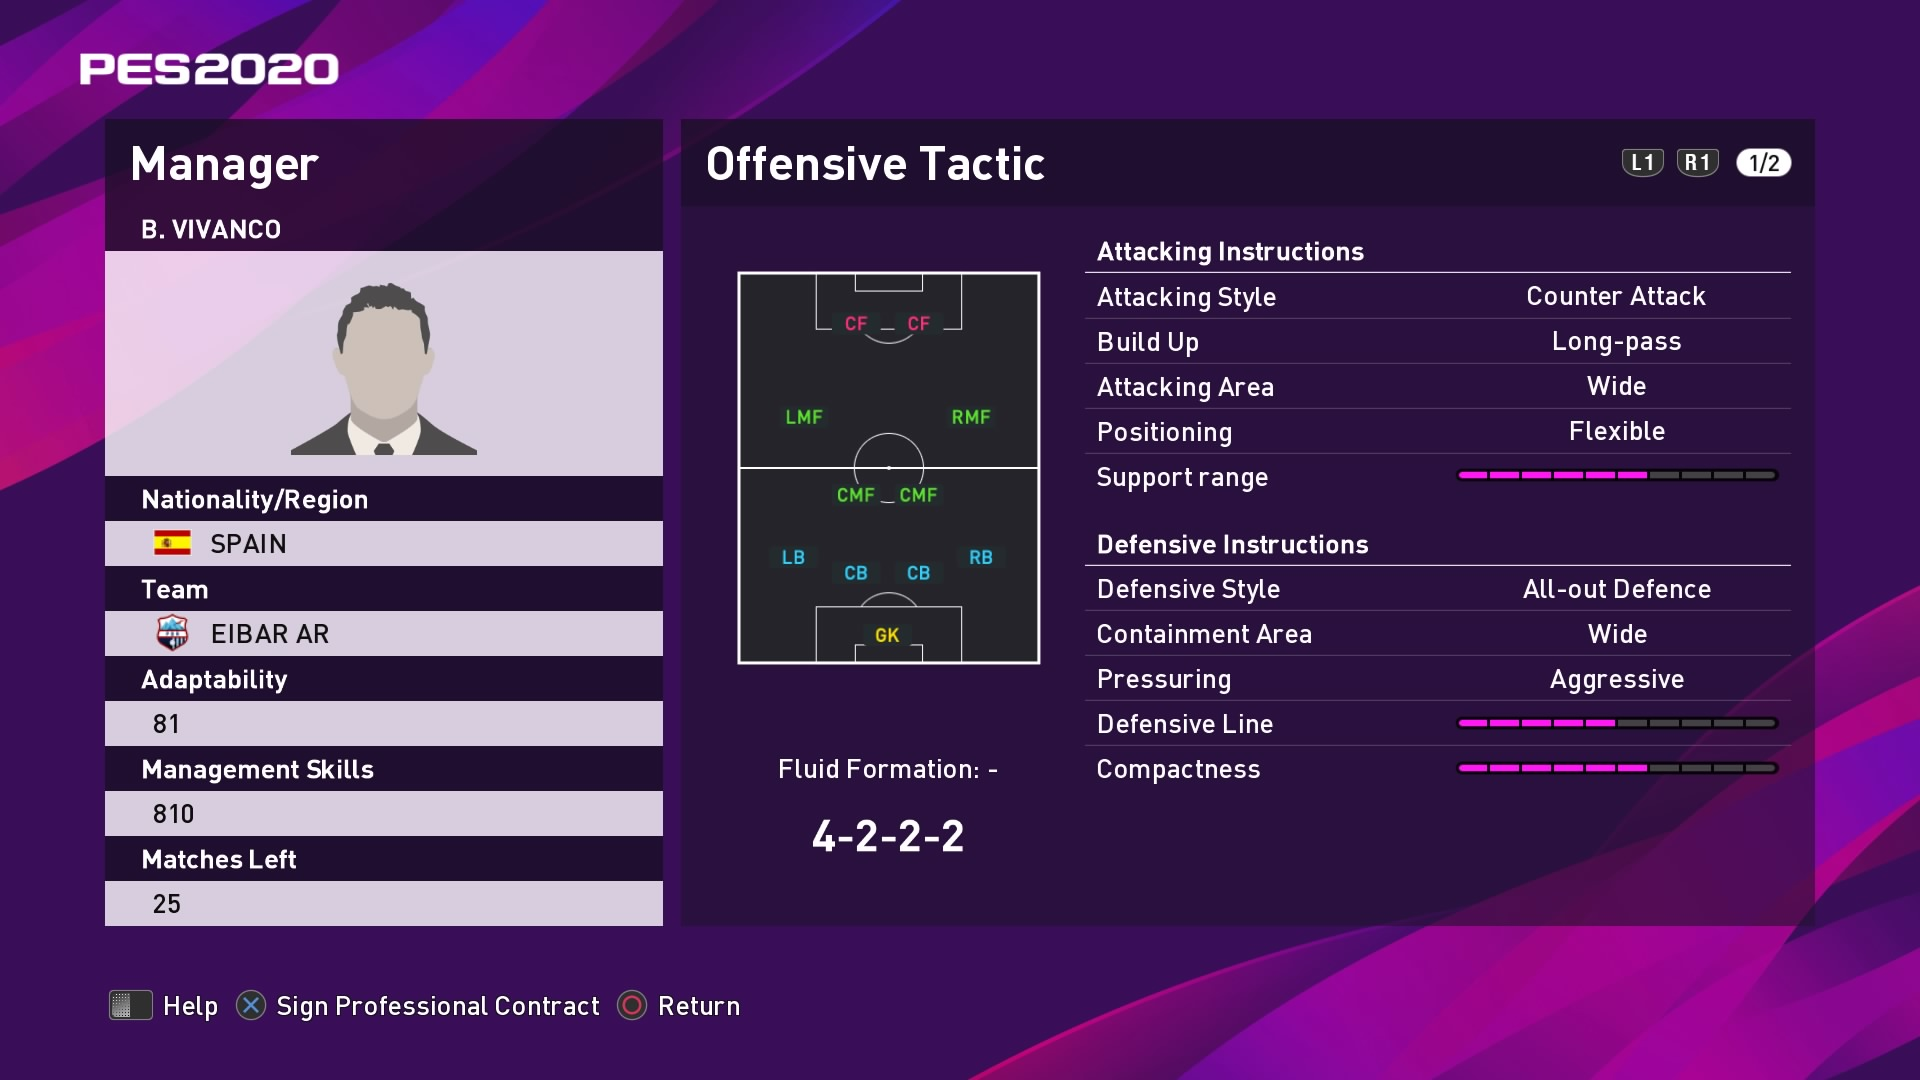 B. Vivanco (José Luis Mendilibar) Offensive Tactic in PES 2020 myClub